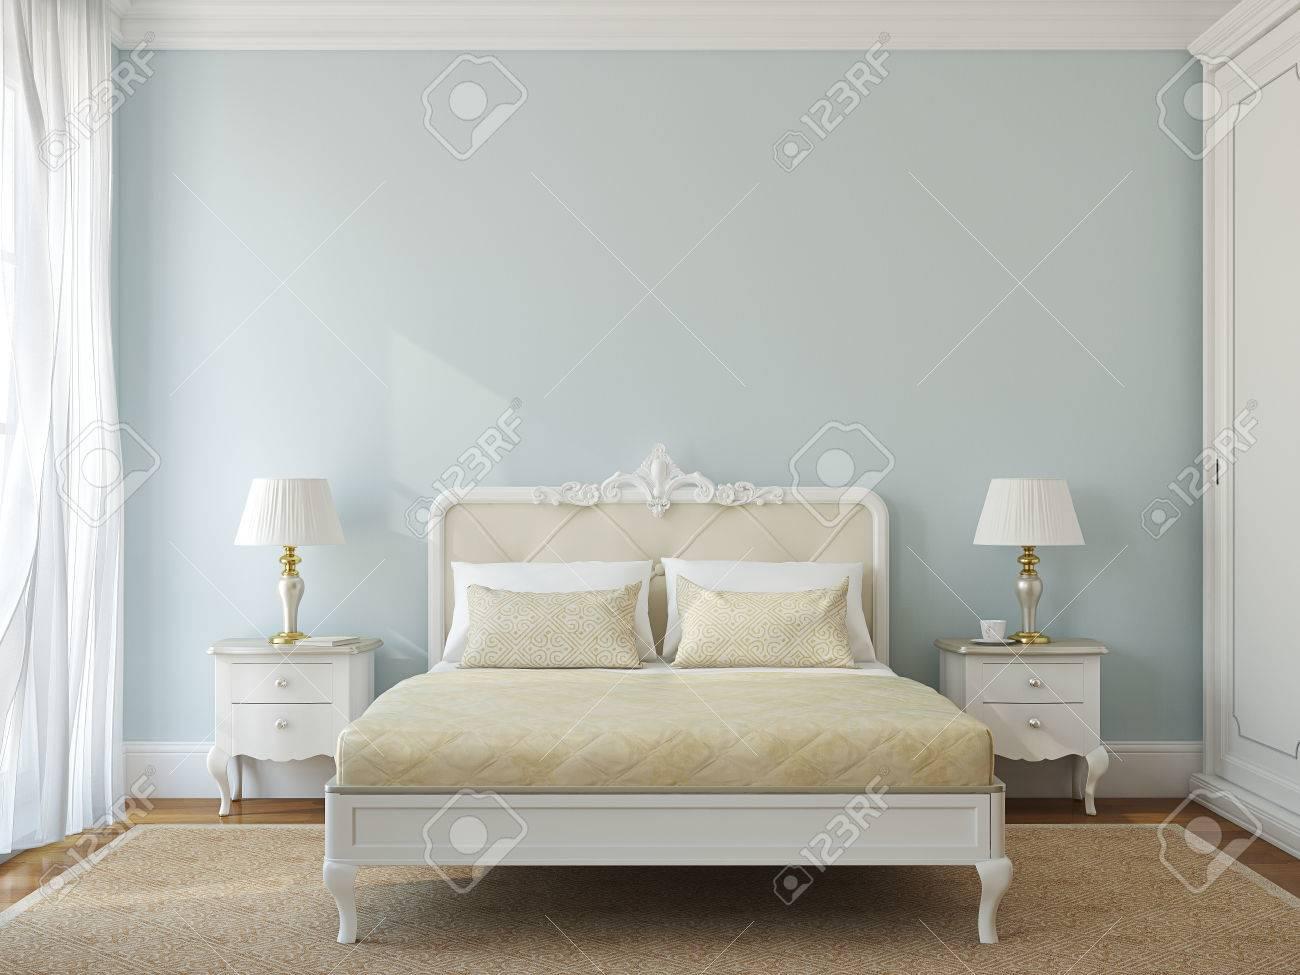 Classical bedroom interior. 3d render. - 44086351